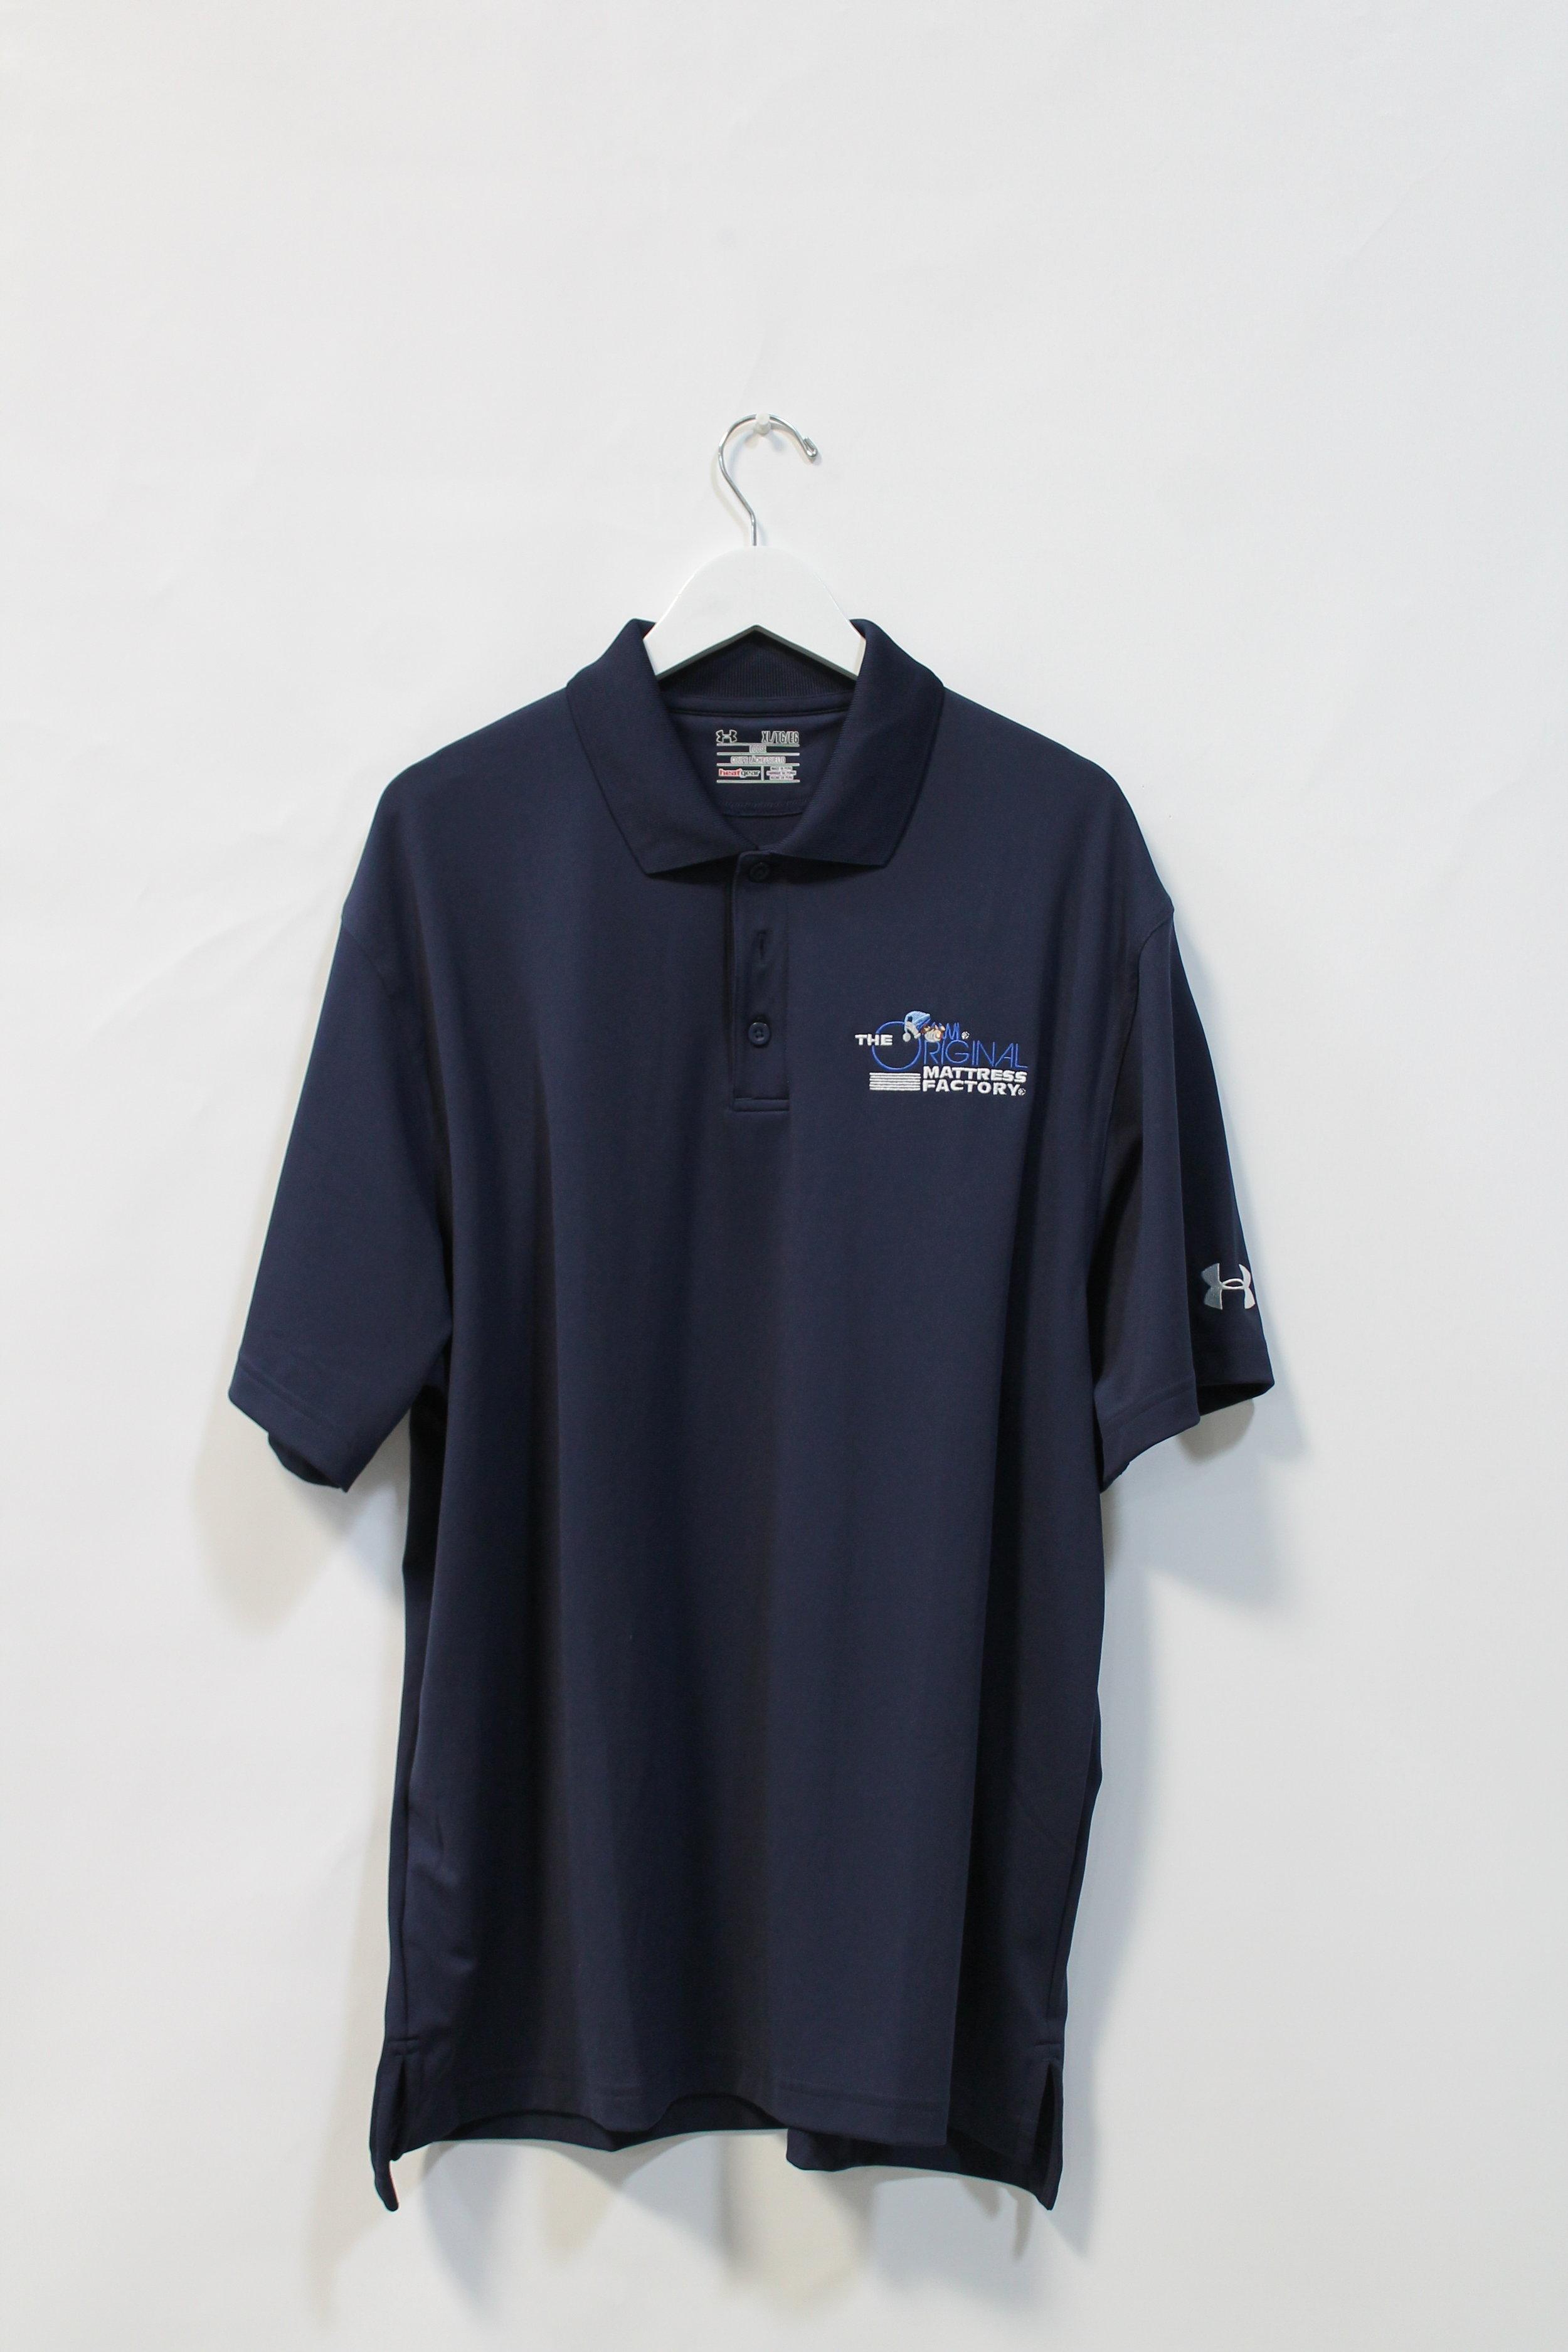 Original_Factory_Shirt.JPG